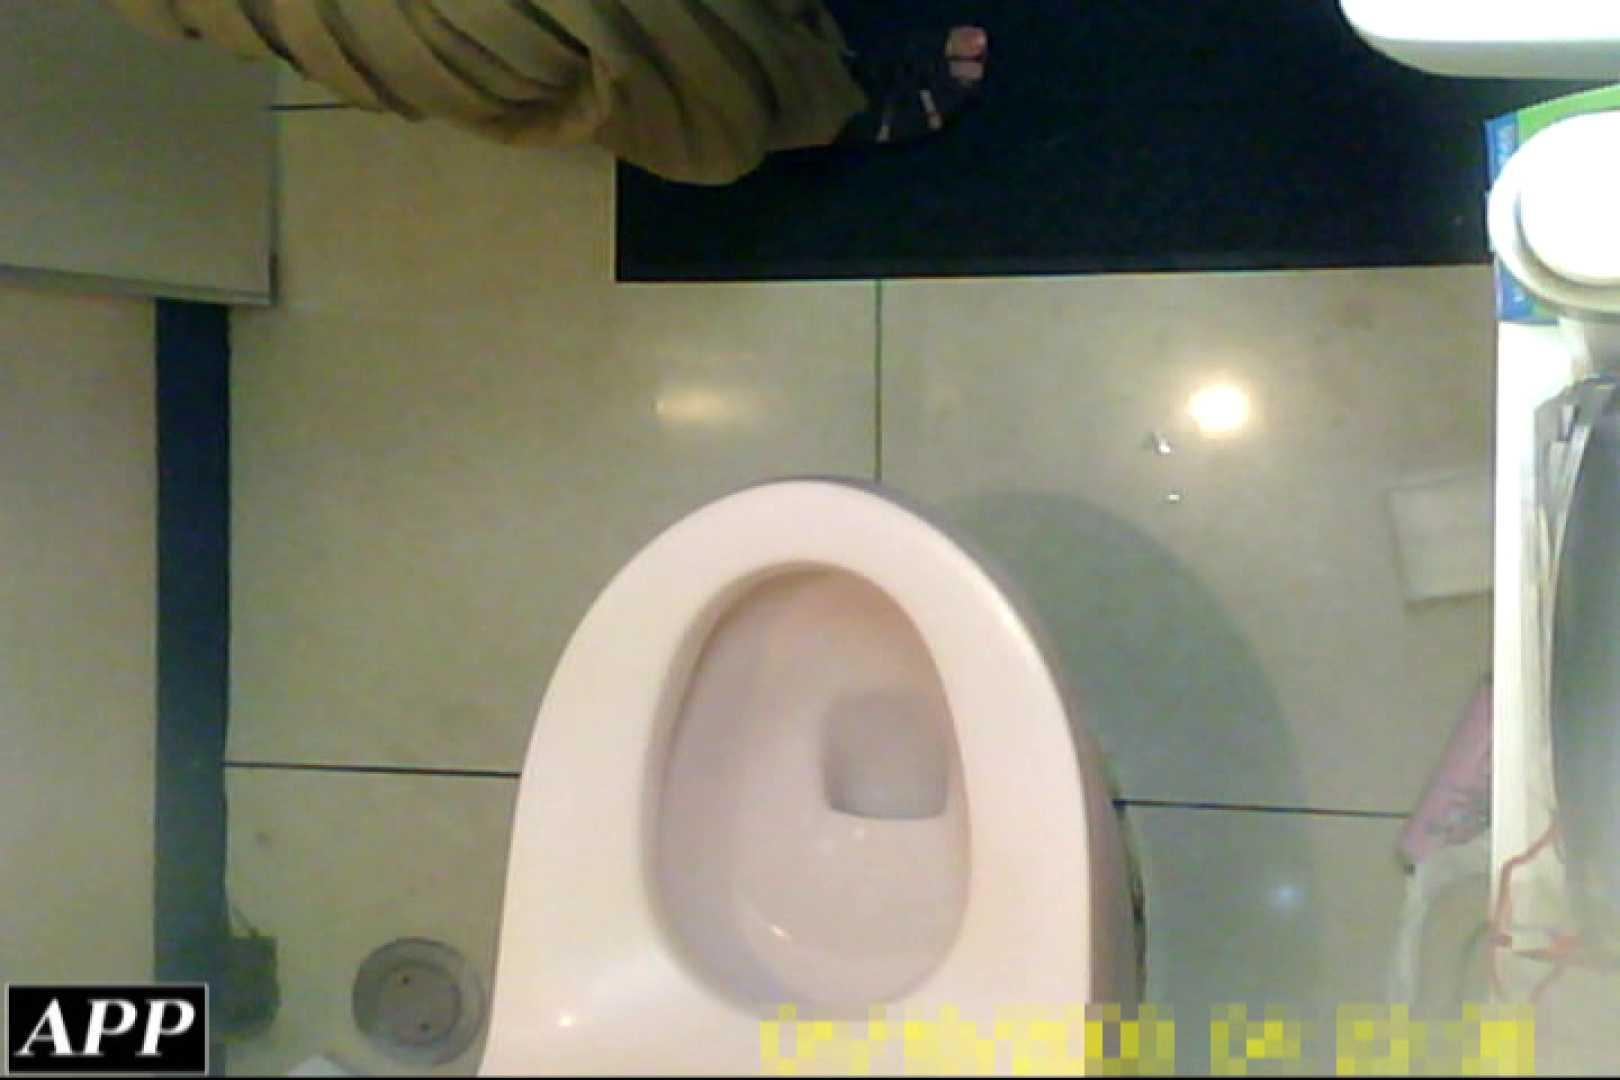 3視点洗面所 vol.128 肛門 | マンコ特集  93連発 37